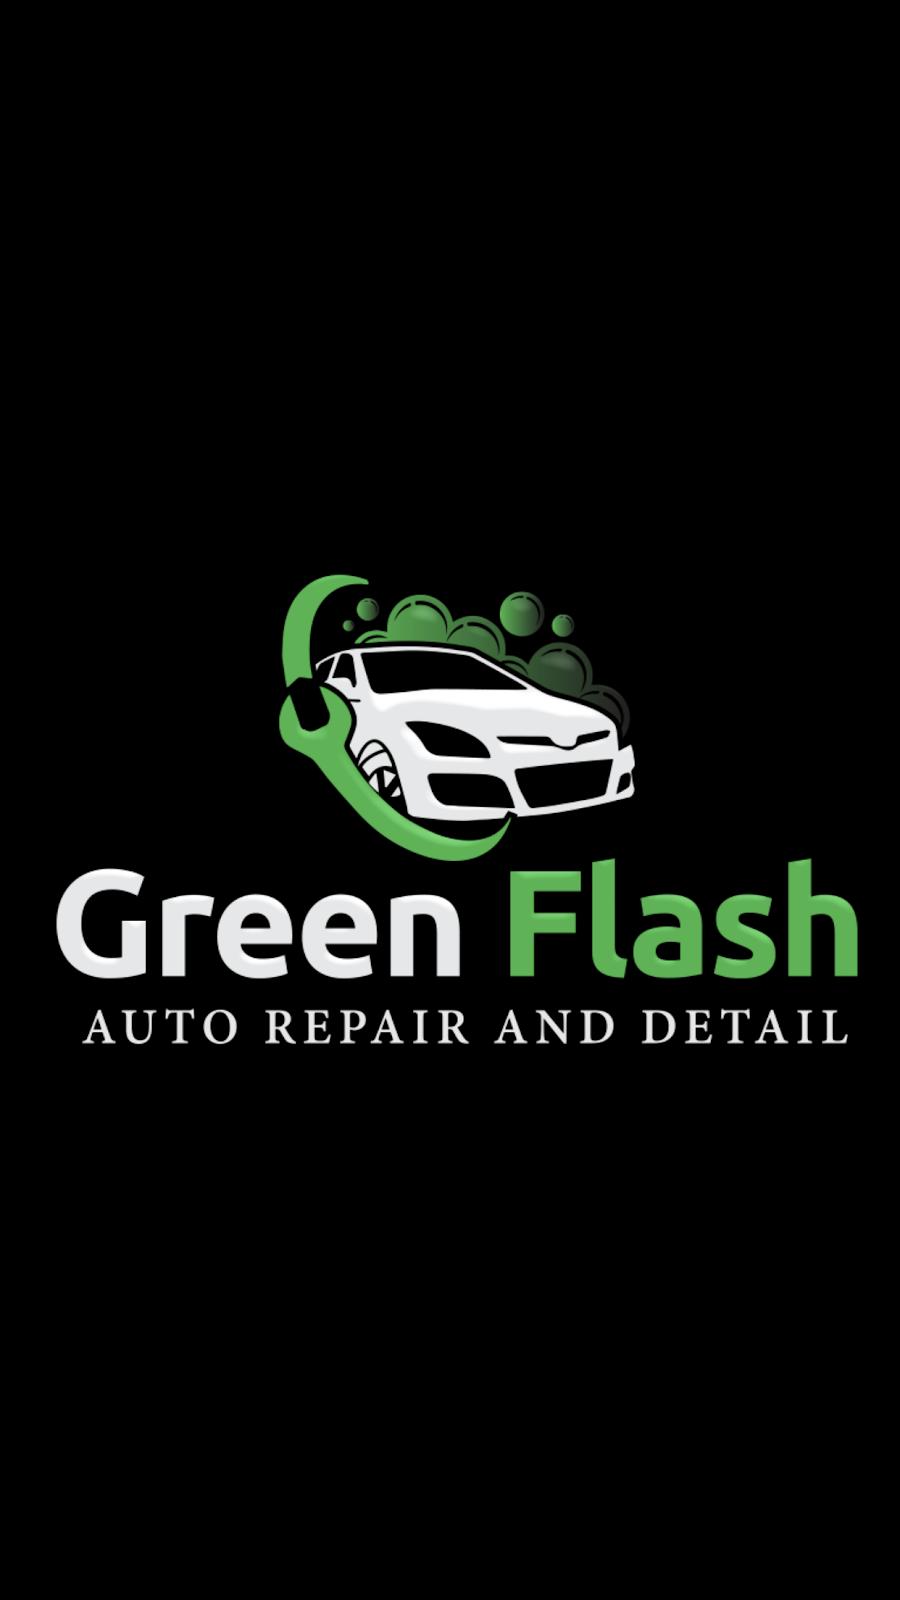 Green Flash Automotive and Detail - car repair  | Photo 1 of 1 | Address: 2457 Cedar Falls Rd, Franklinville, NC 27248, USA | Phone: (336) 308-9591